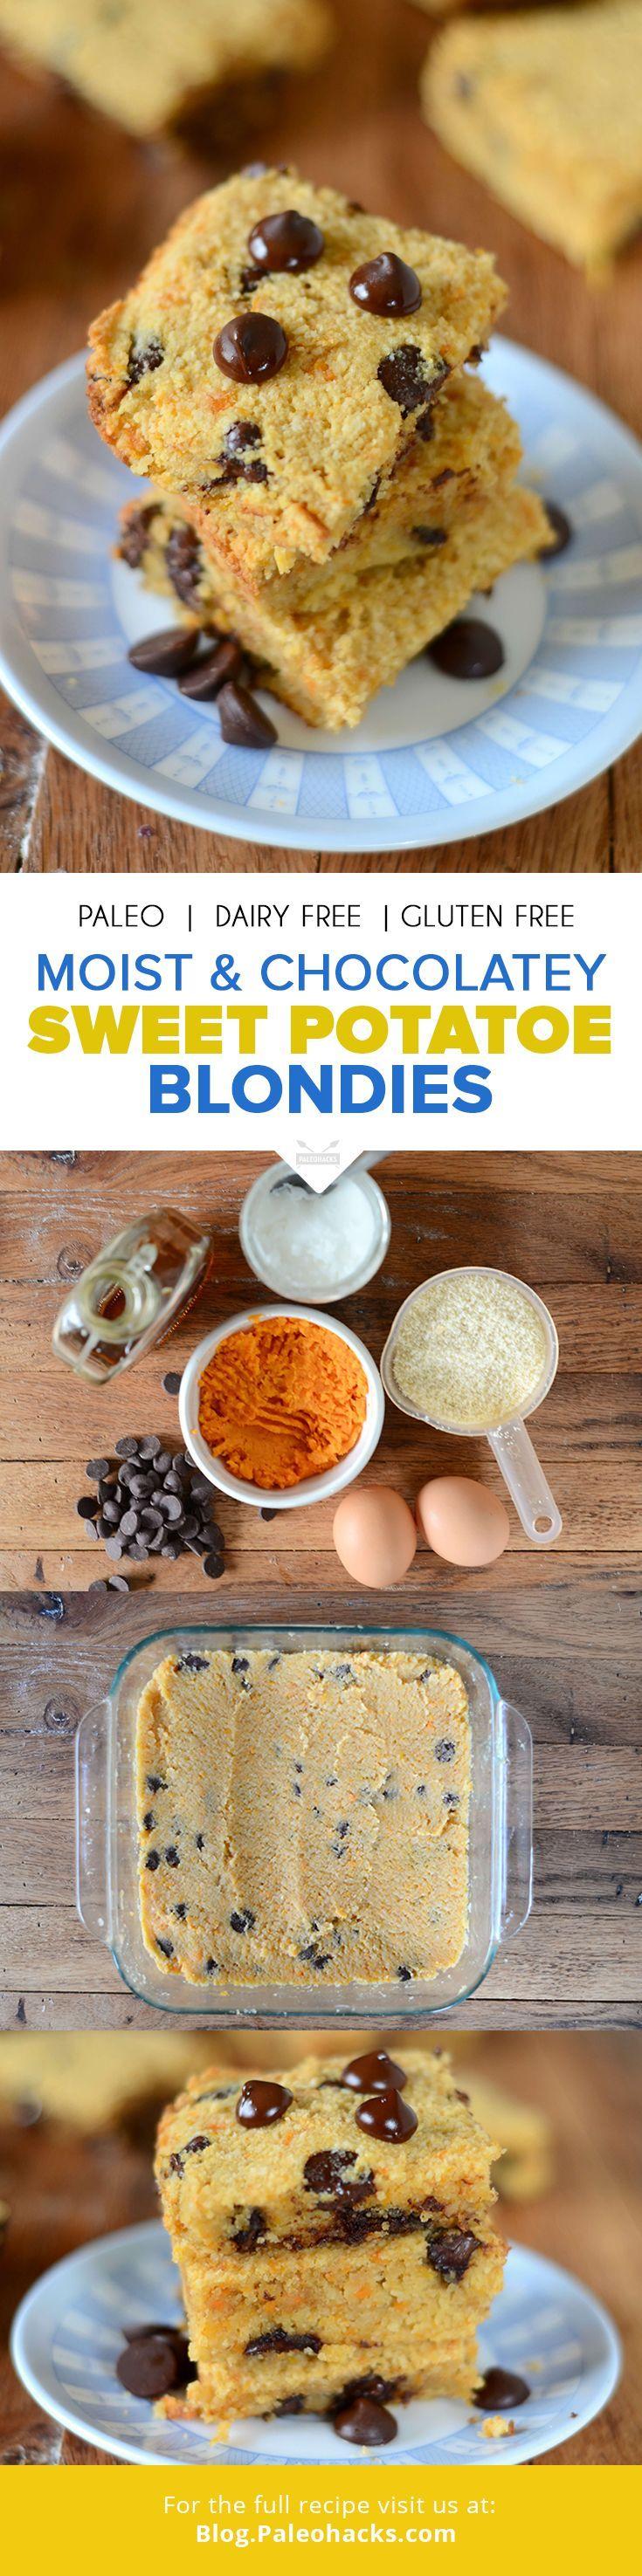 PIN-moist-and-chocolatey-sweet-potato-blondies.jpg